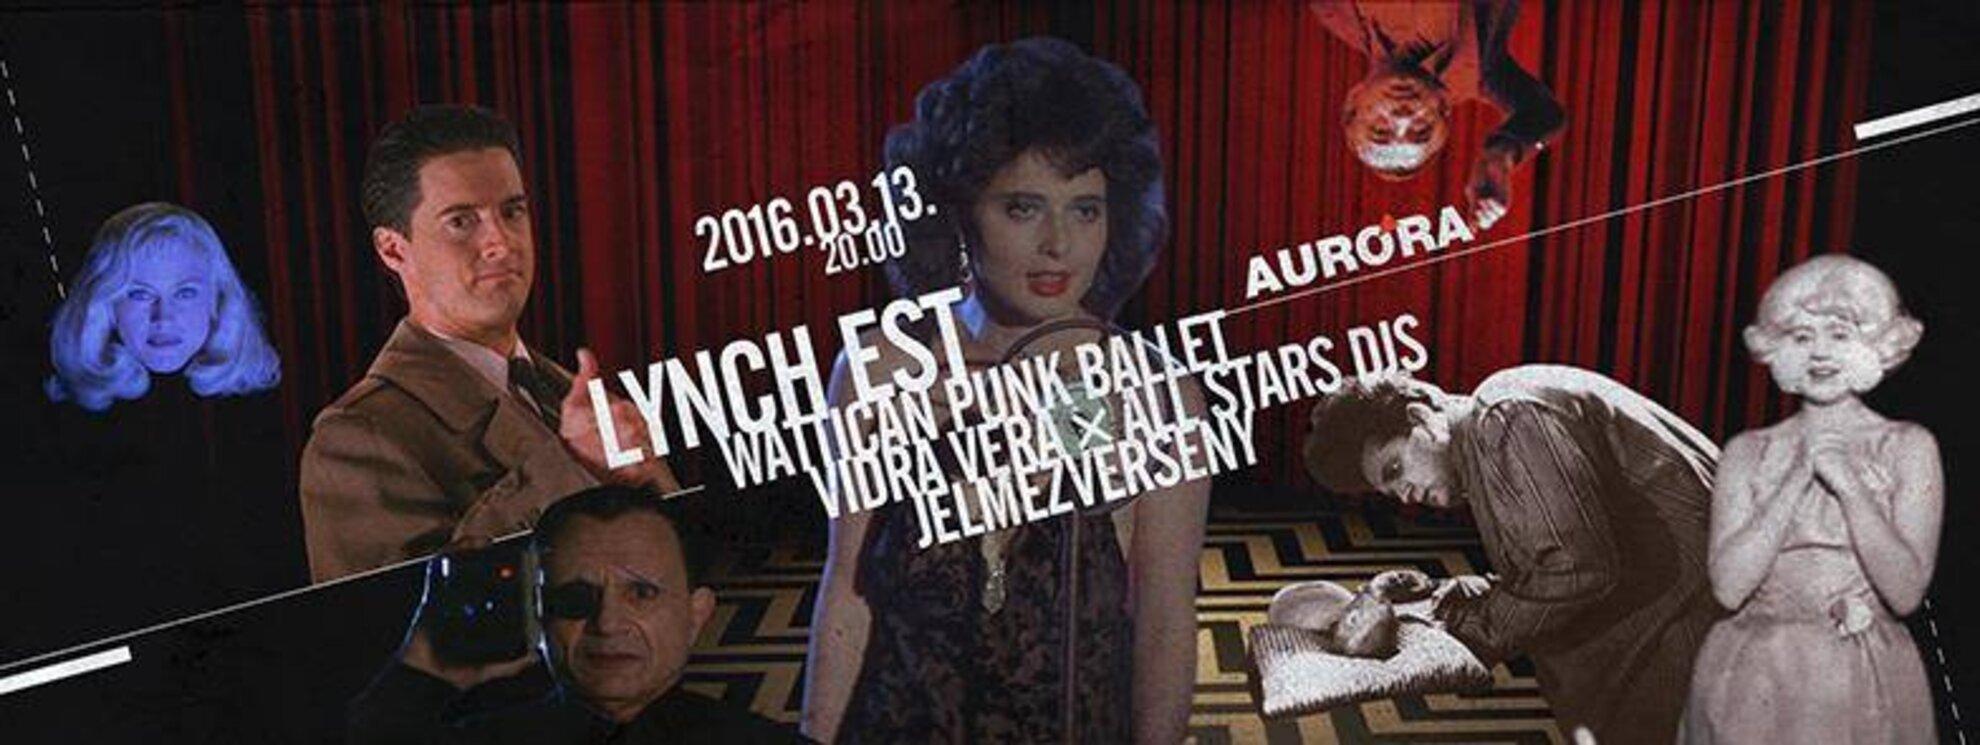 Lynch Est / Wattican Punk Ballet x Vidra Vera dj set